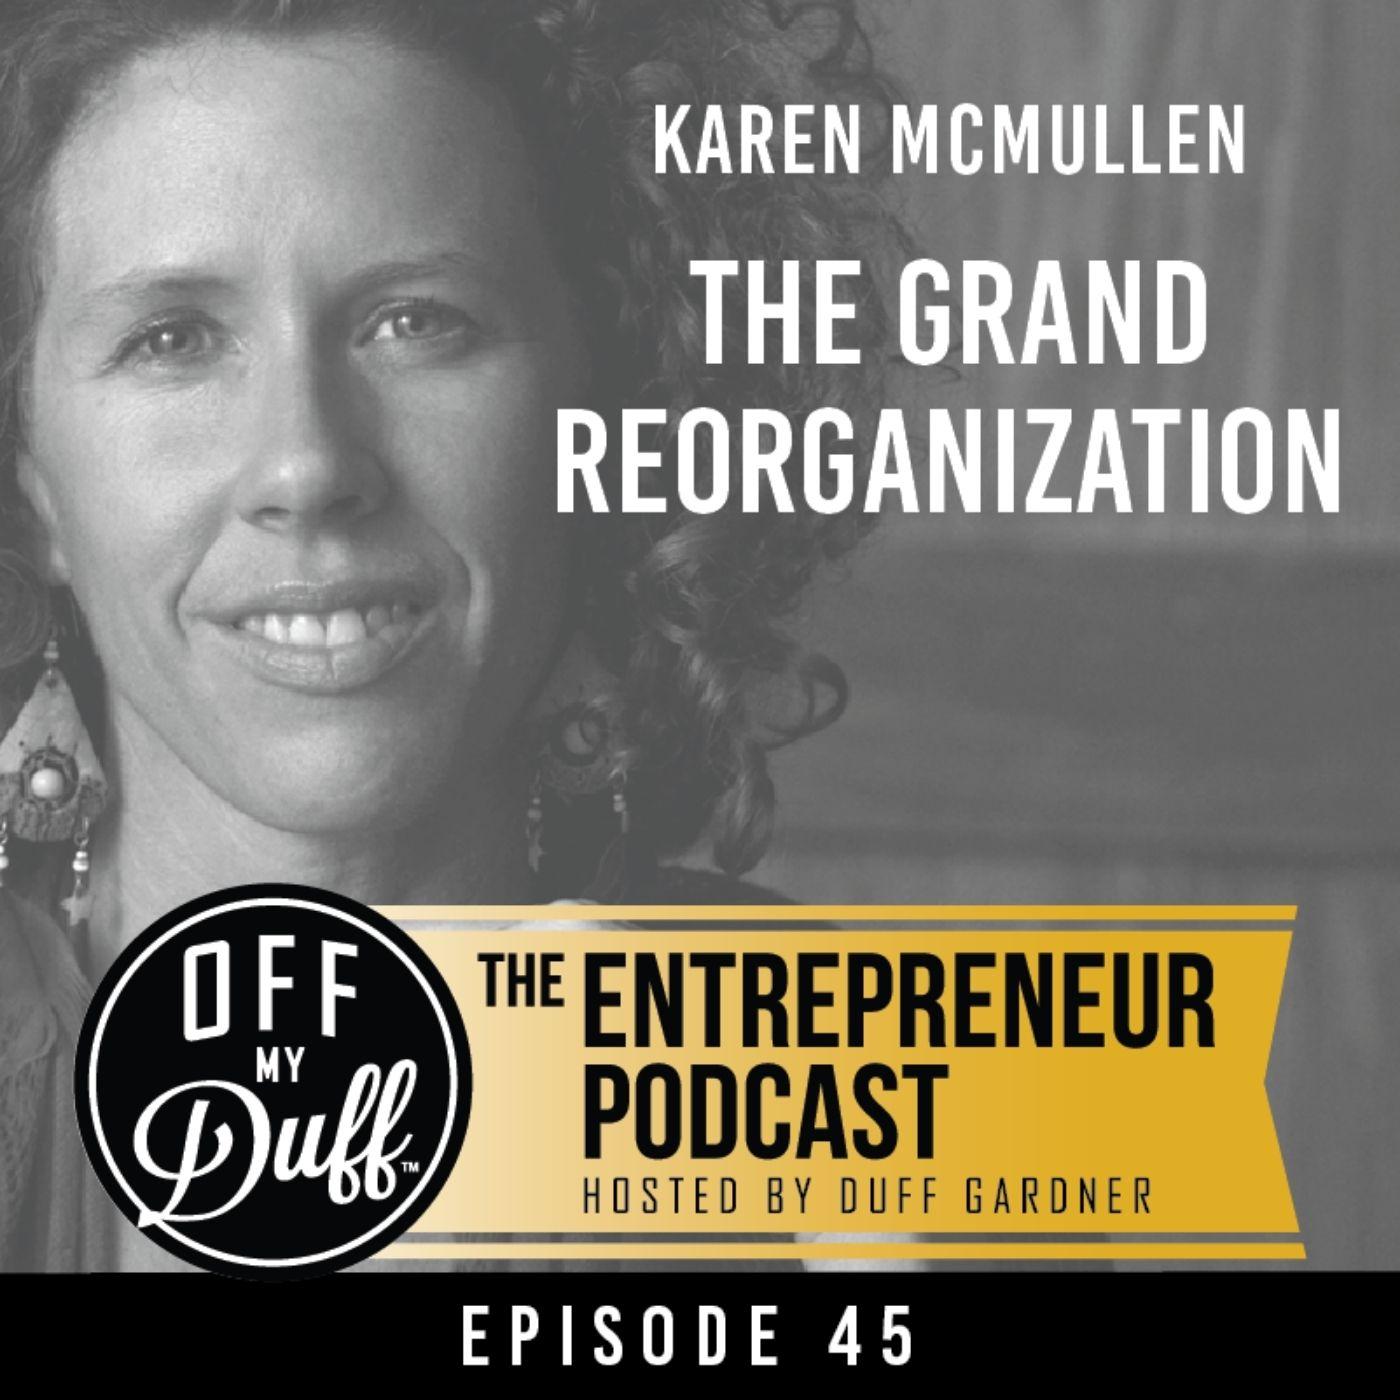 Karen McMullen – The Grand Reorganization